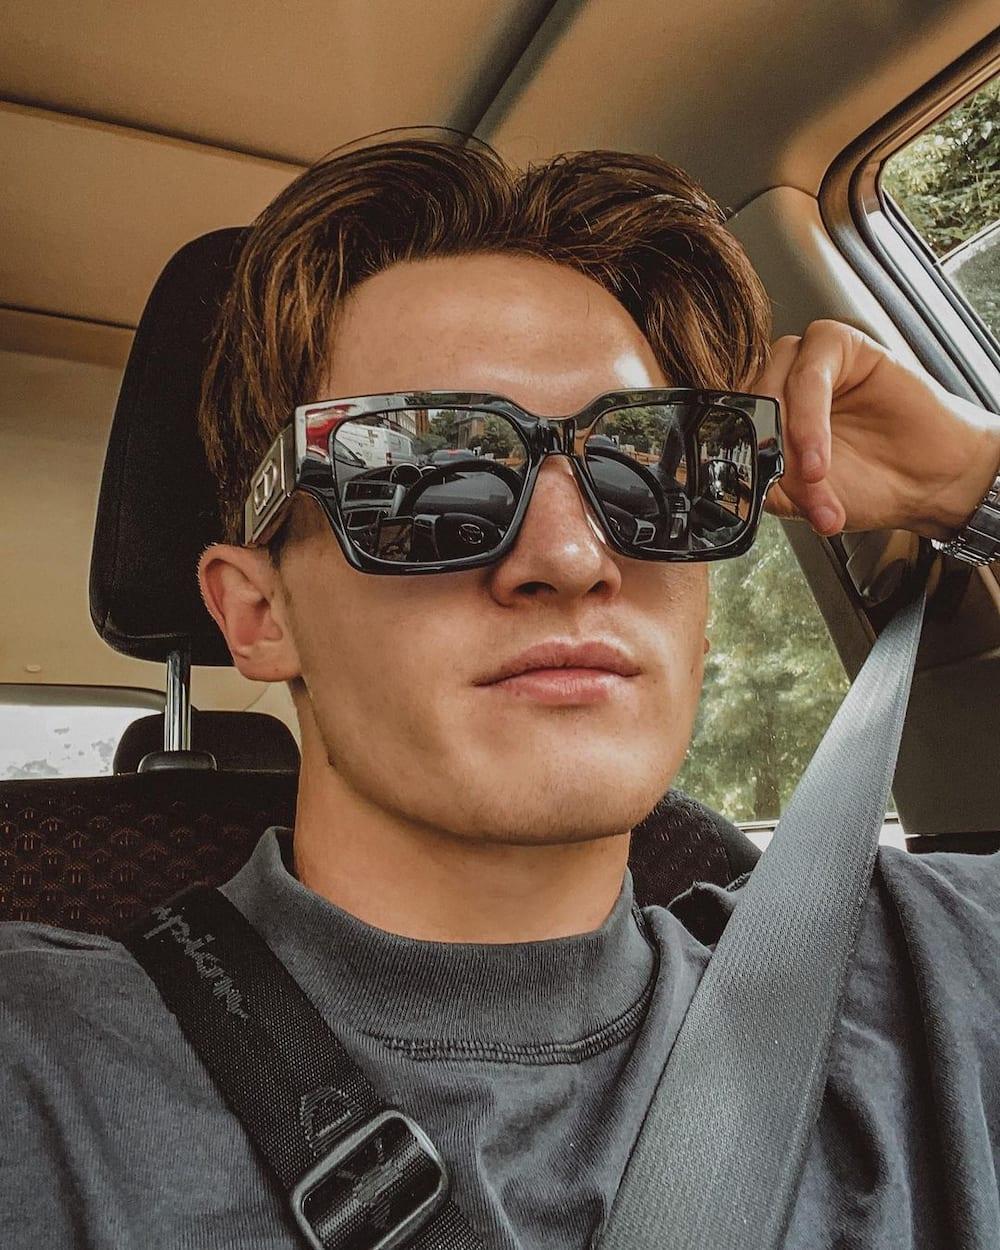 eboy haircut middle part